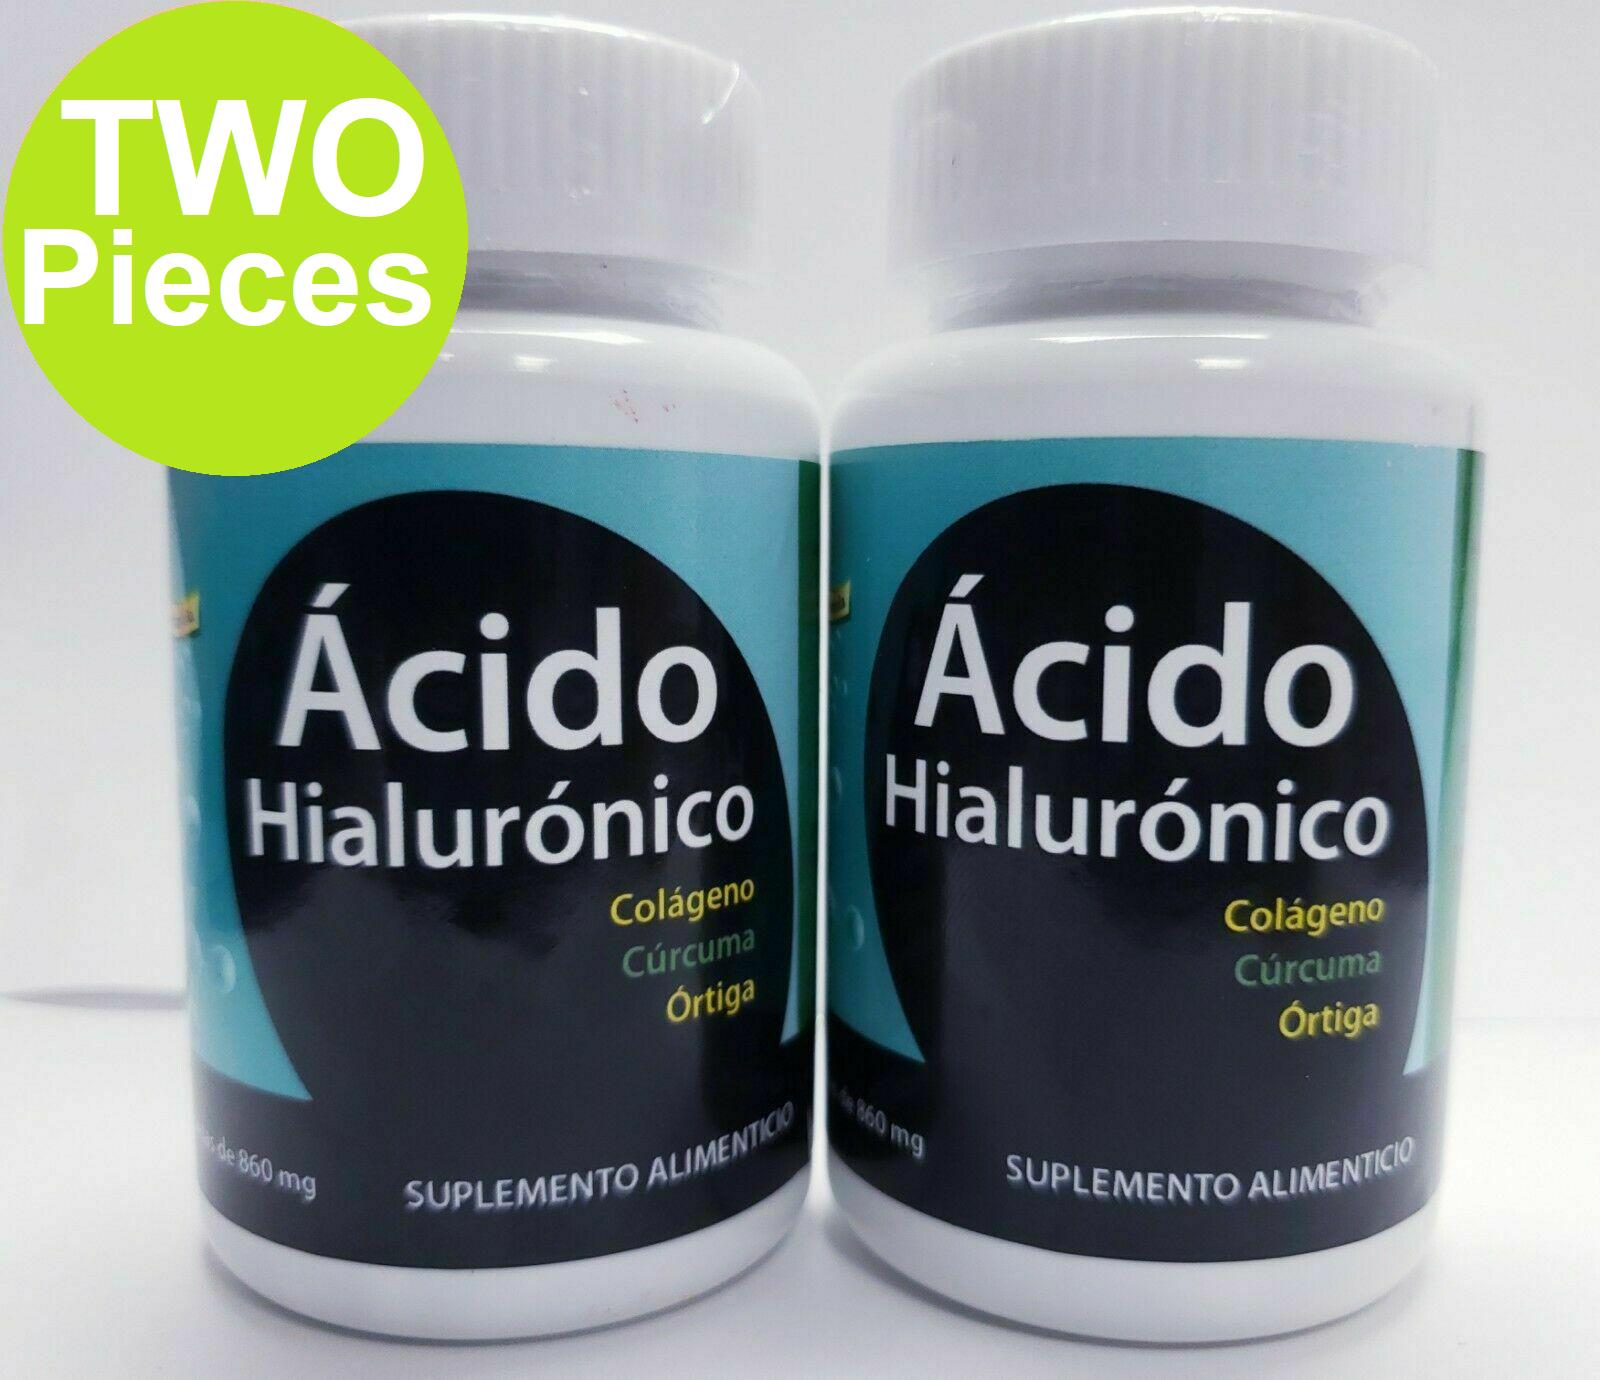 2 Pack ACIDO HIALURONICO + COLAGENO +ORTIGA CURCUMA CONDROITINA 30 caps